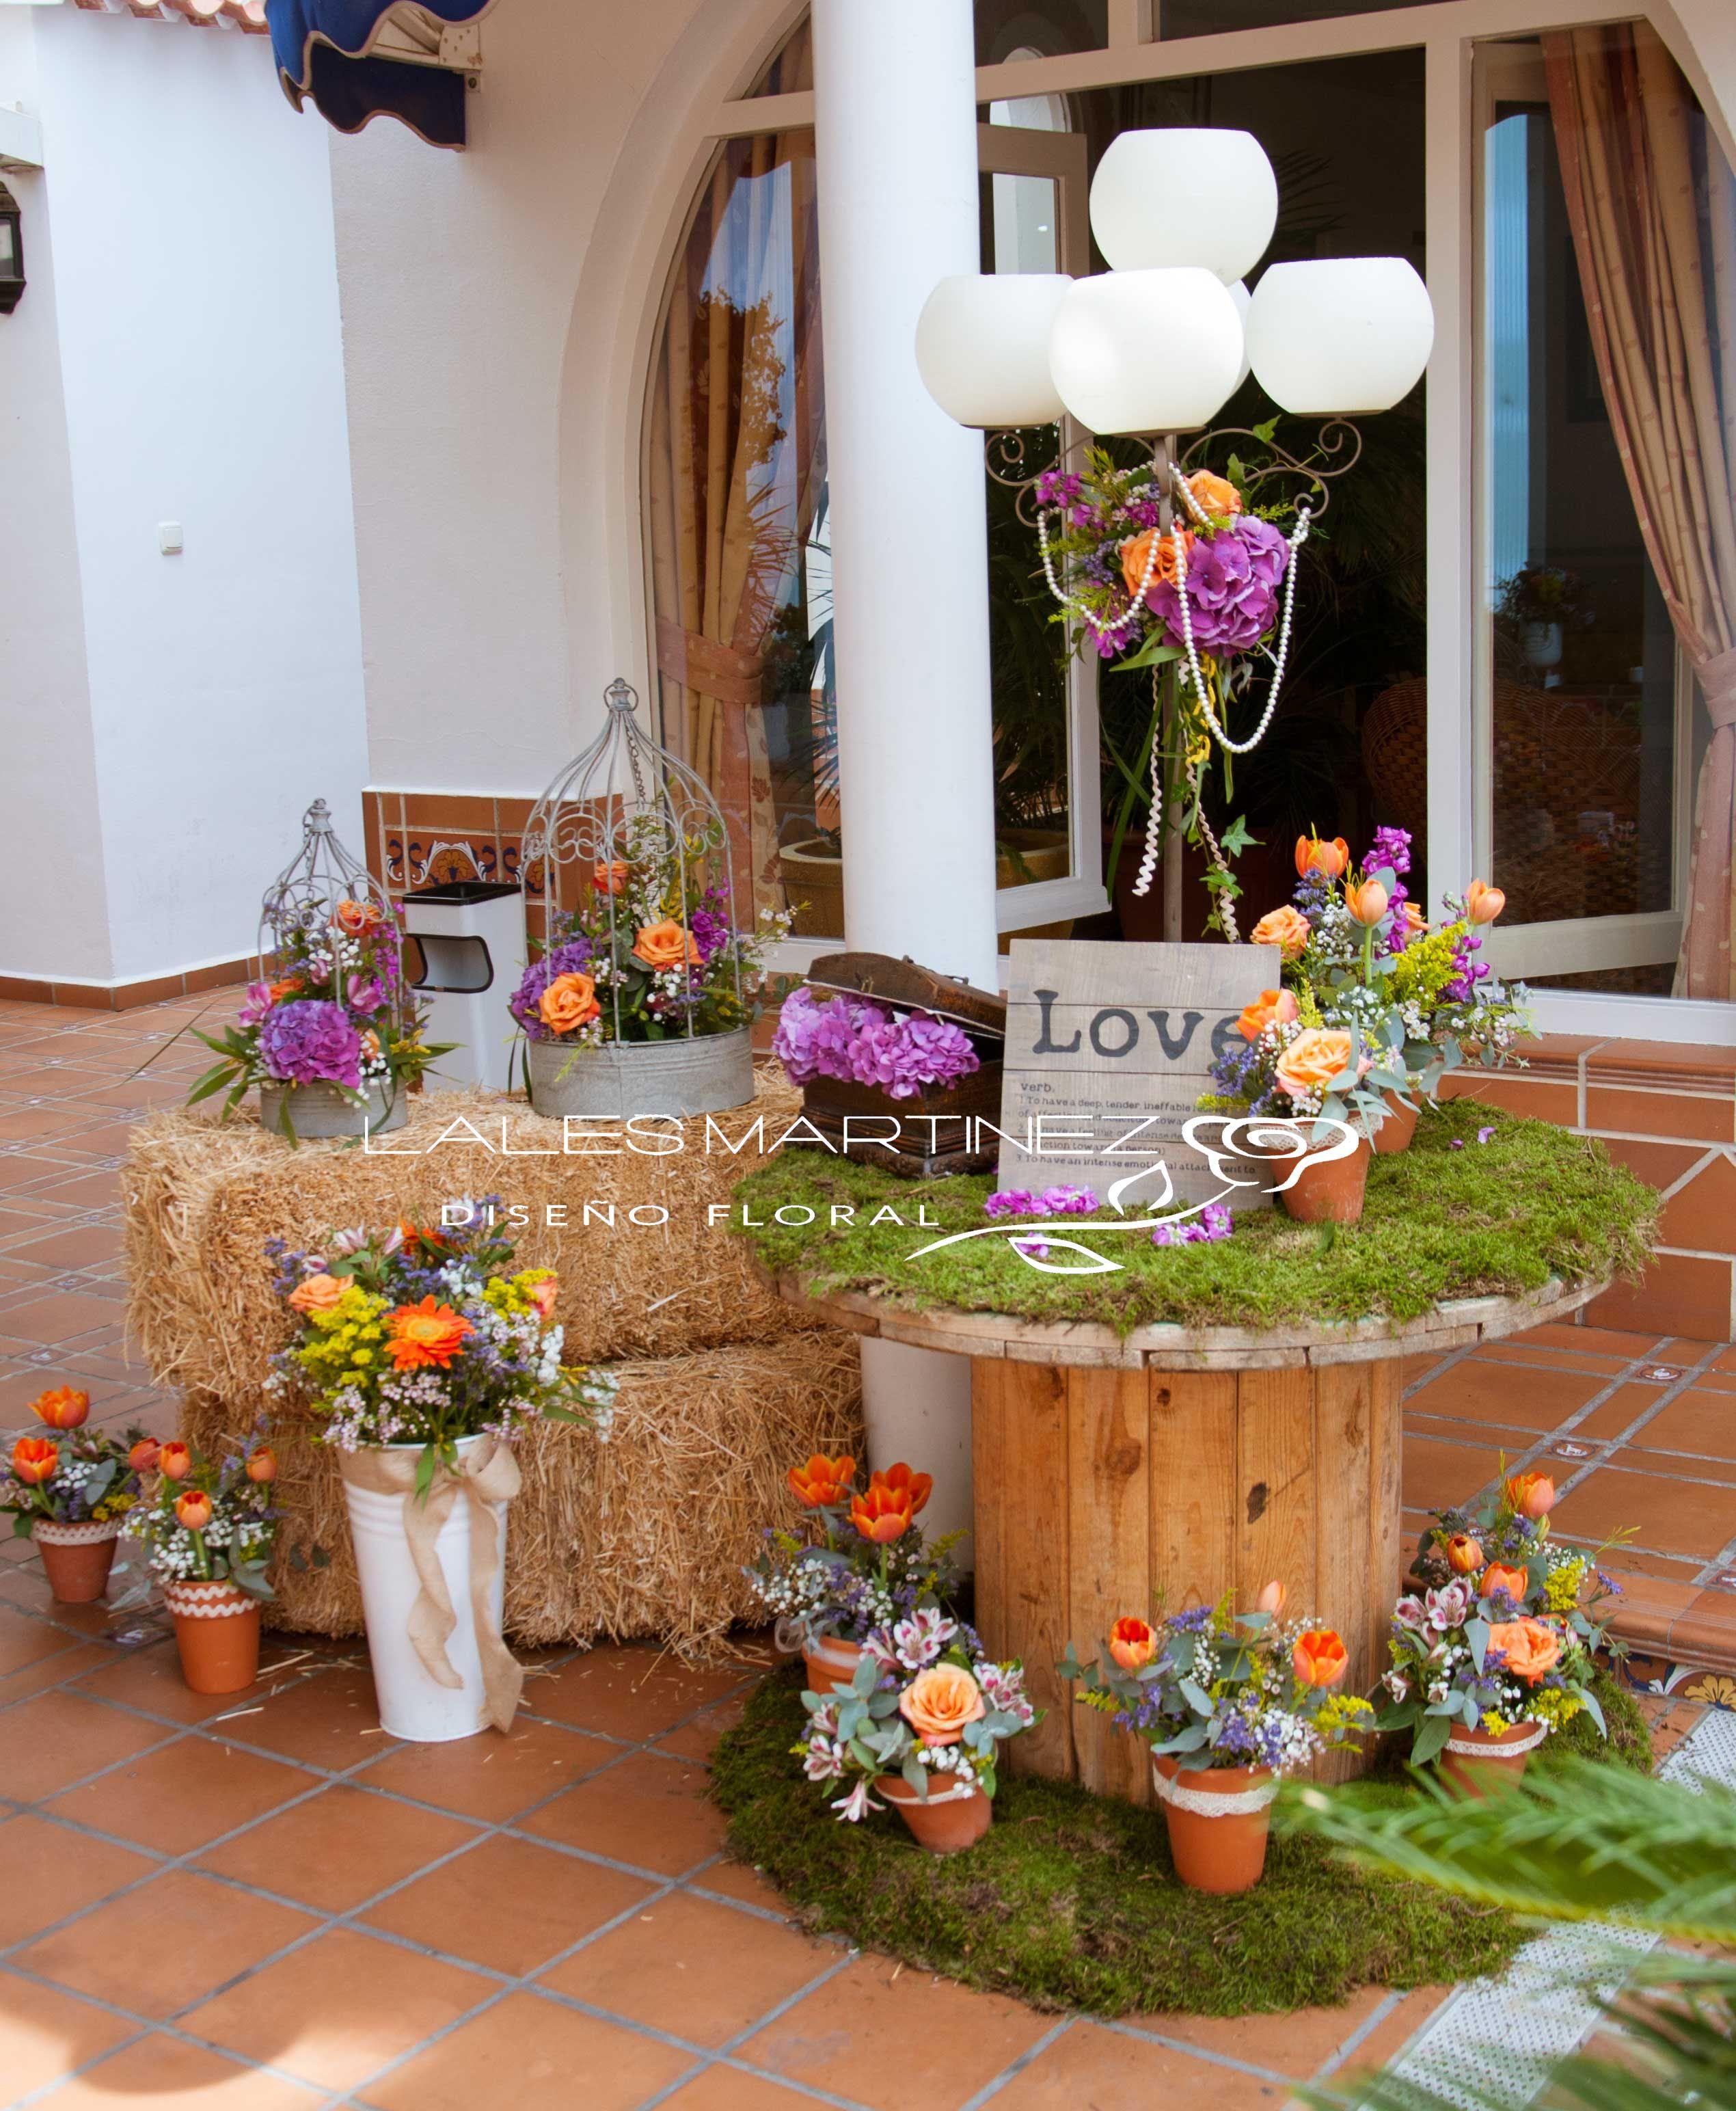 Matrimonio Civil Rustico : Decoración rústico ideias festa decoracion bodas boda